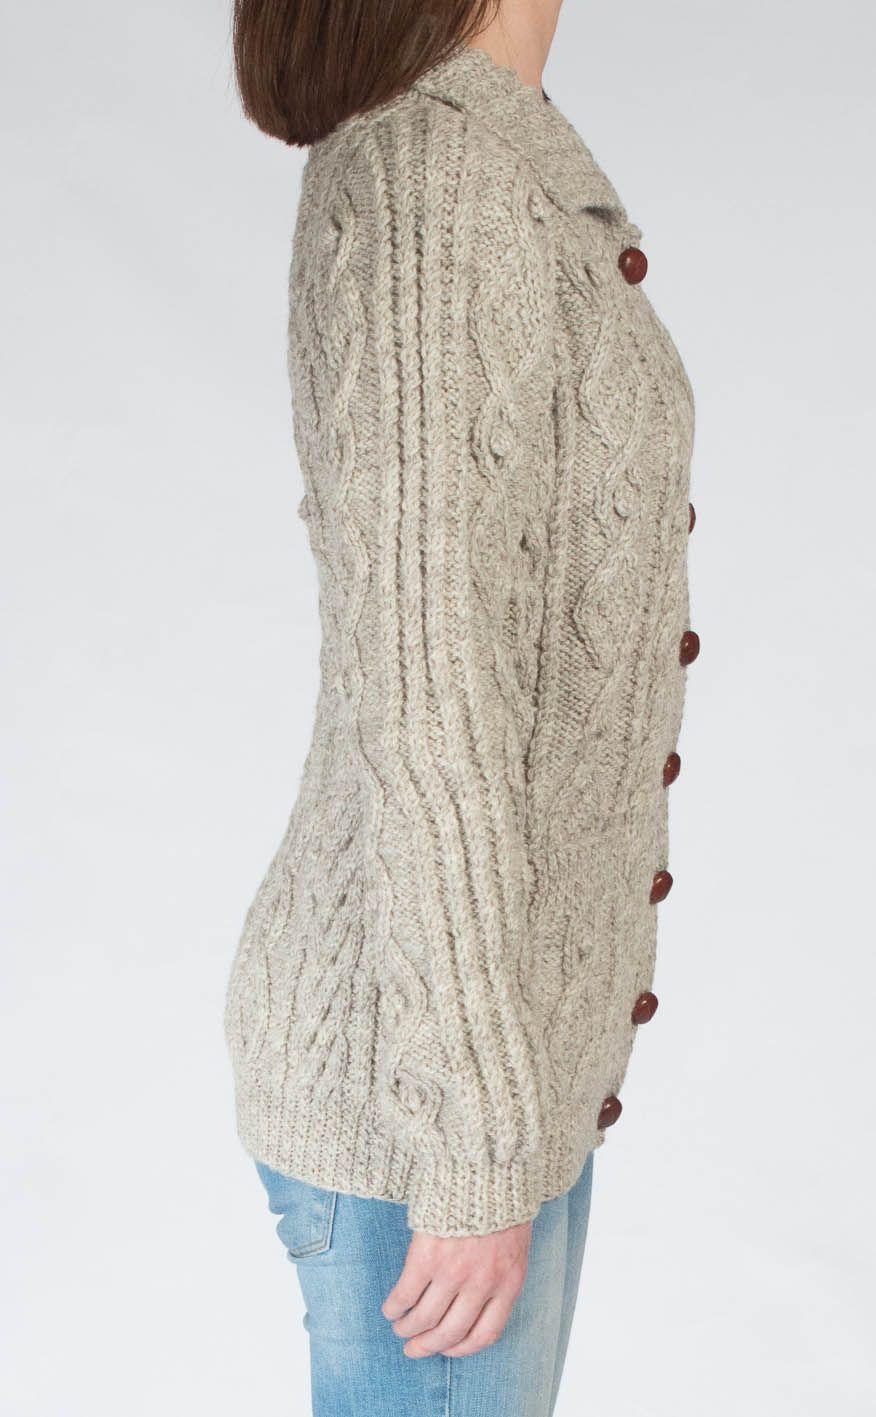 Ladies Luxury Hand Knitted Aran Cardigan Ness by Scotweb, 2020